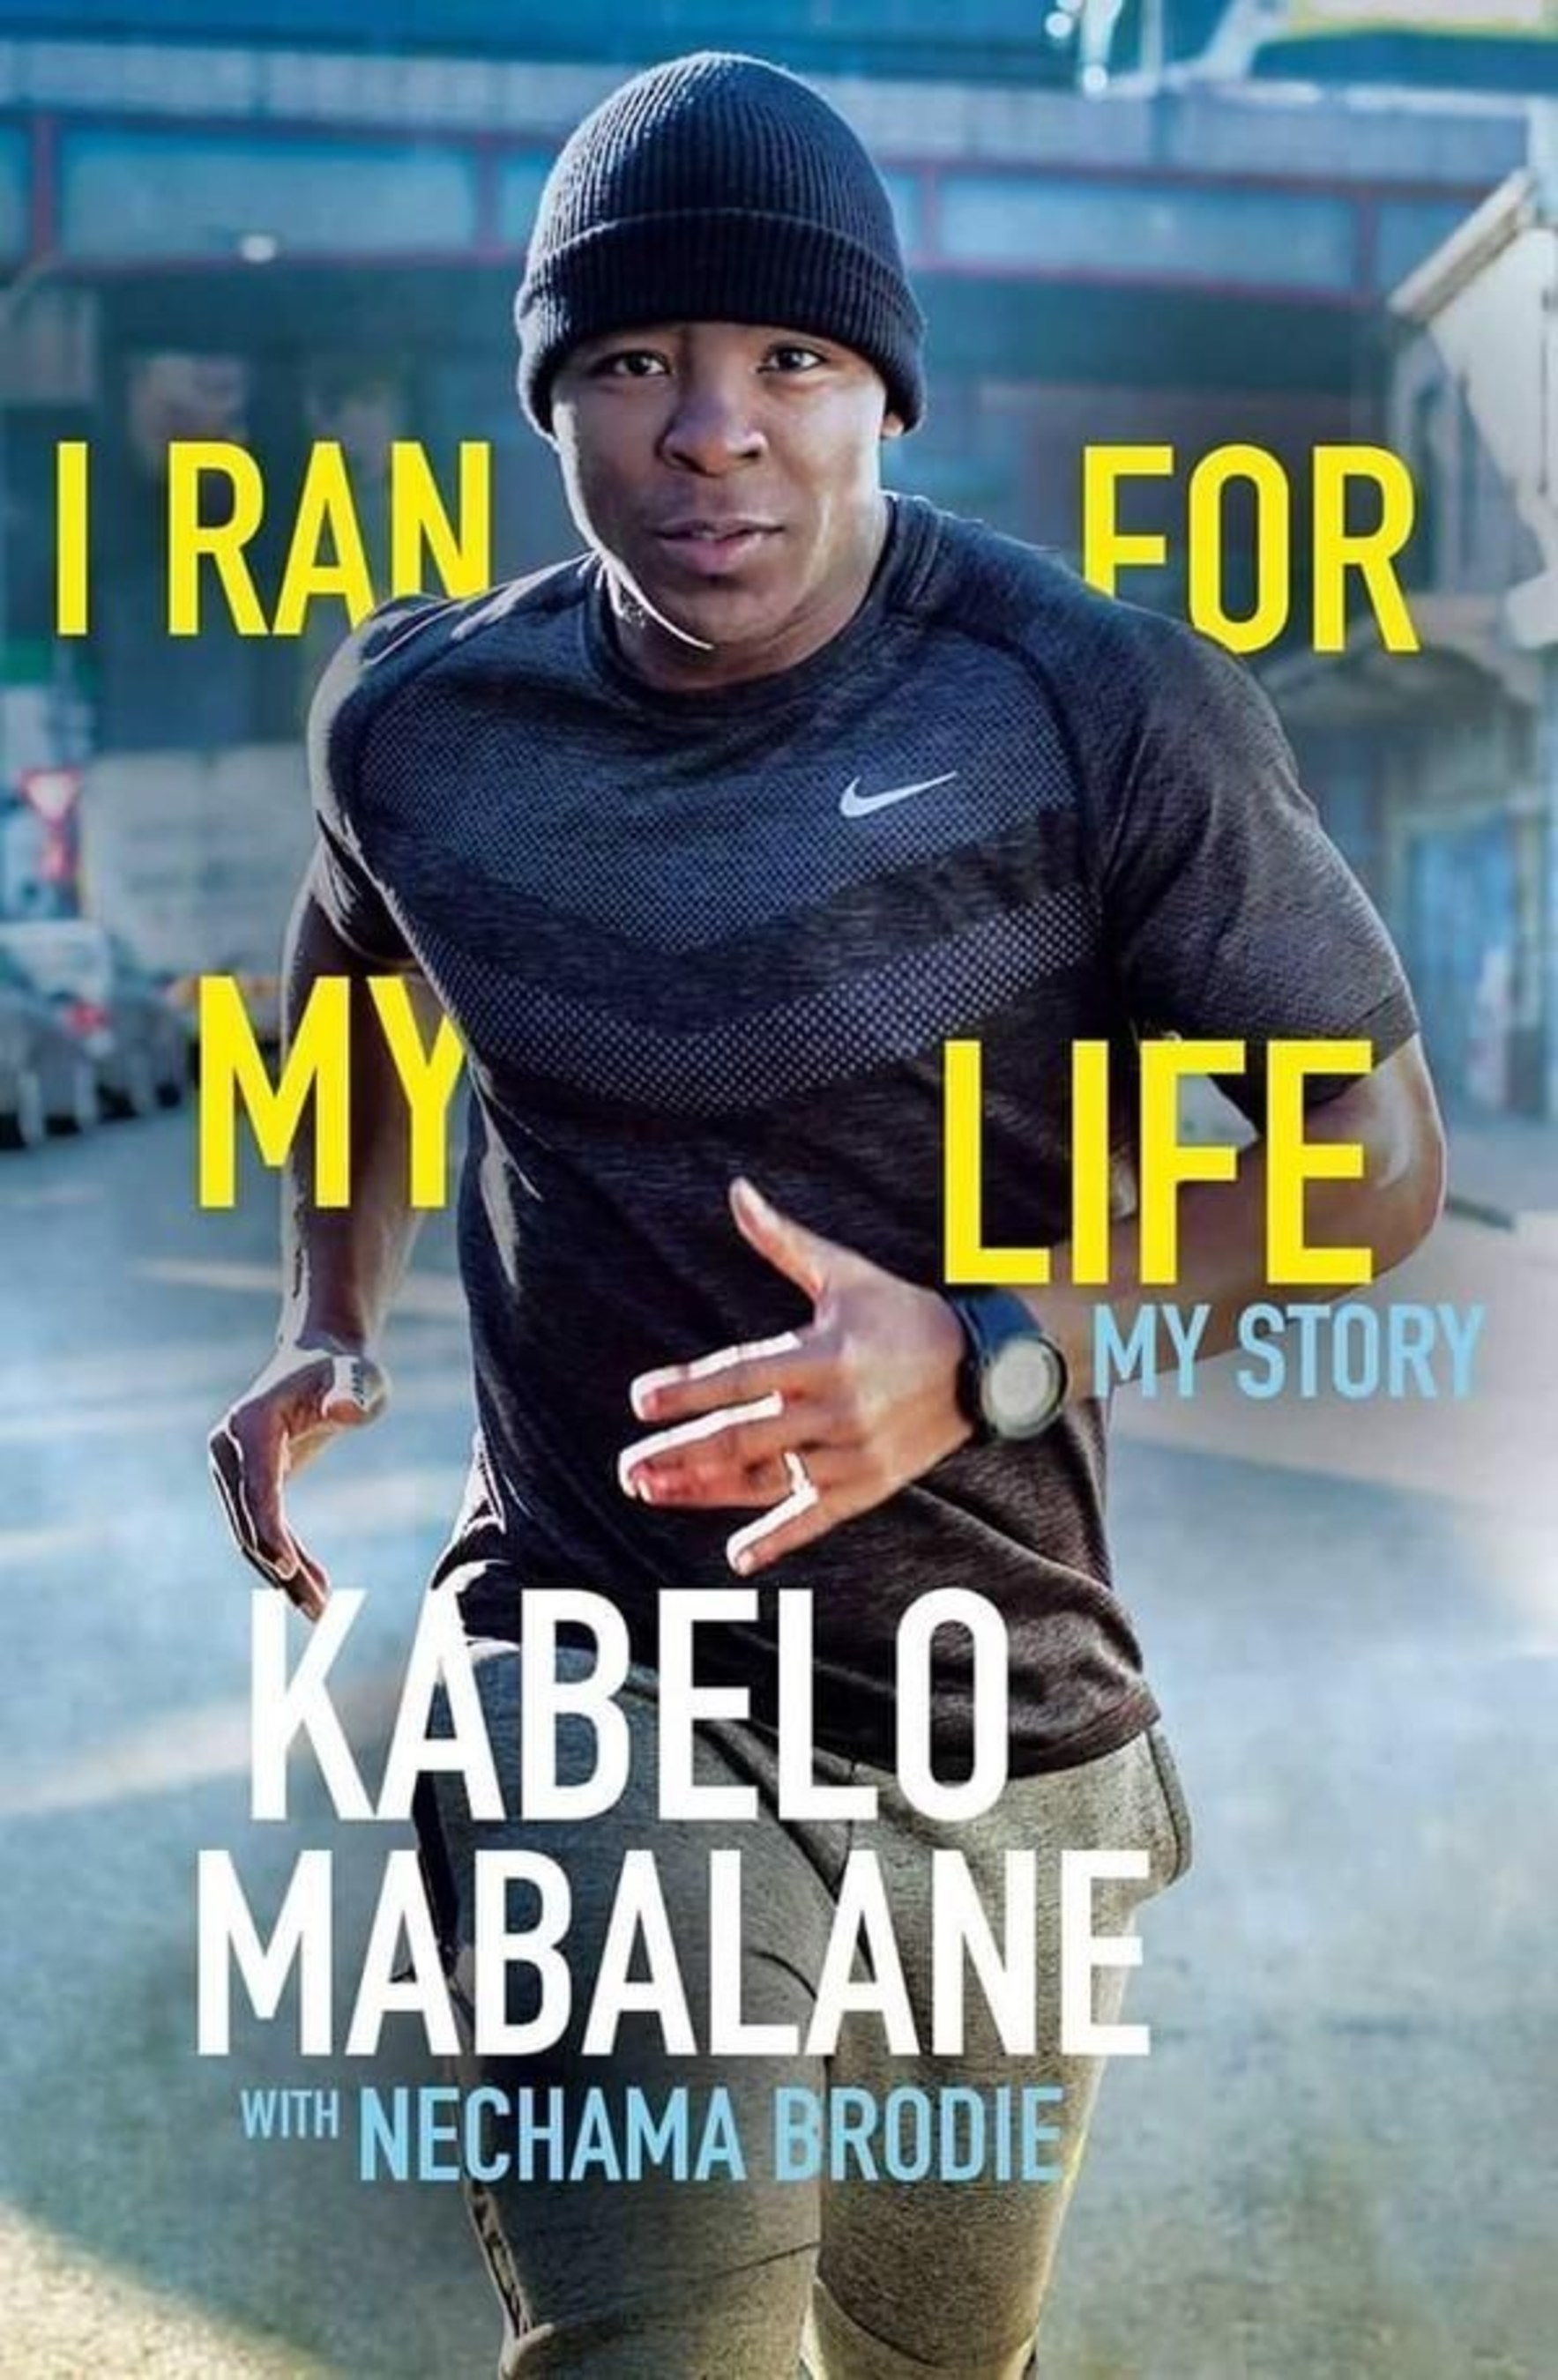 Diacore Gaborone Marathon to host Kabelo Mabalane at its 5th year anniversary (PRNewsFoto/Diacore) (PRNewsFoto/Diacore)